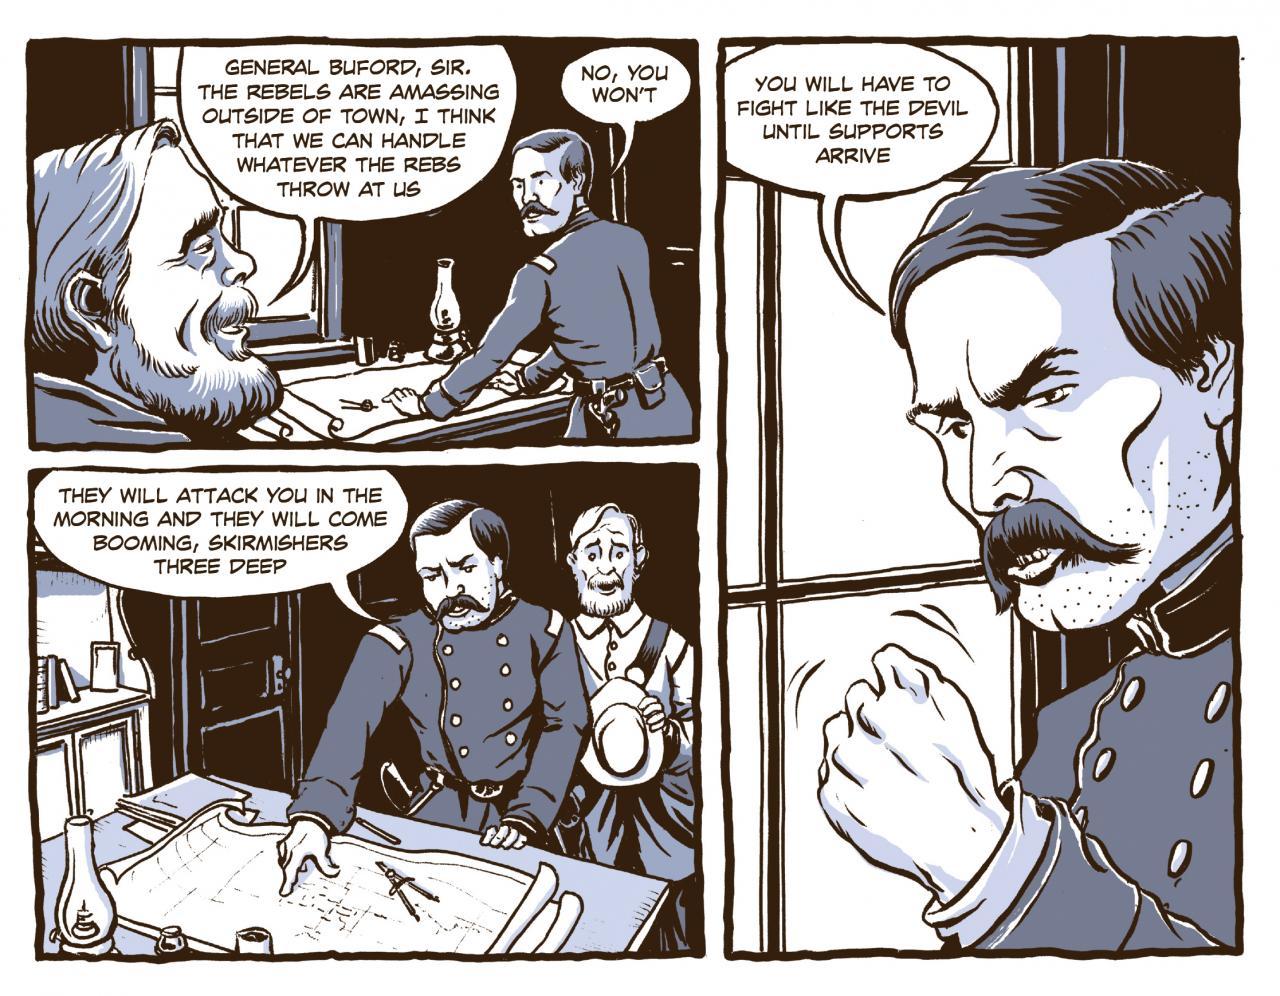 Gettysburg_Illustration_2